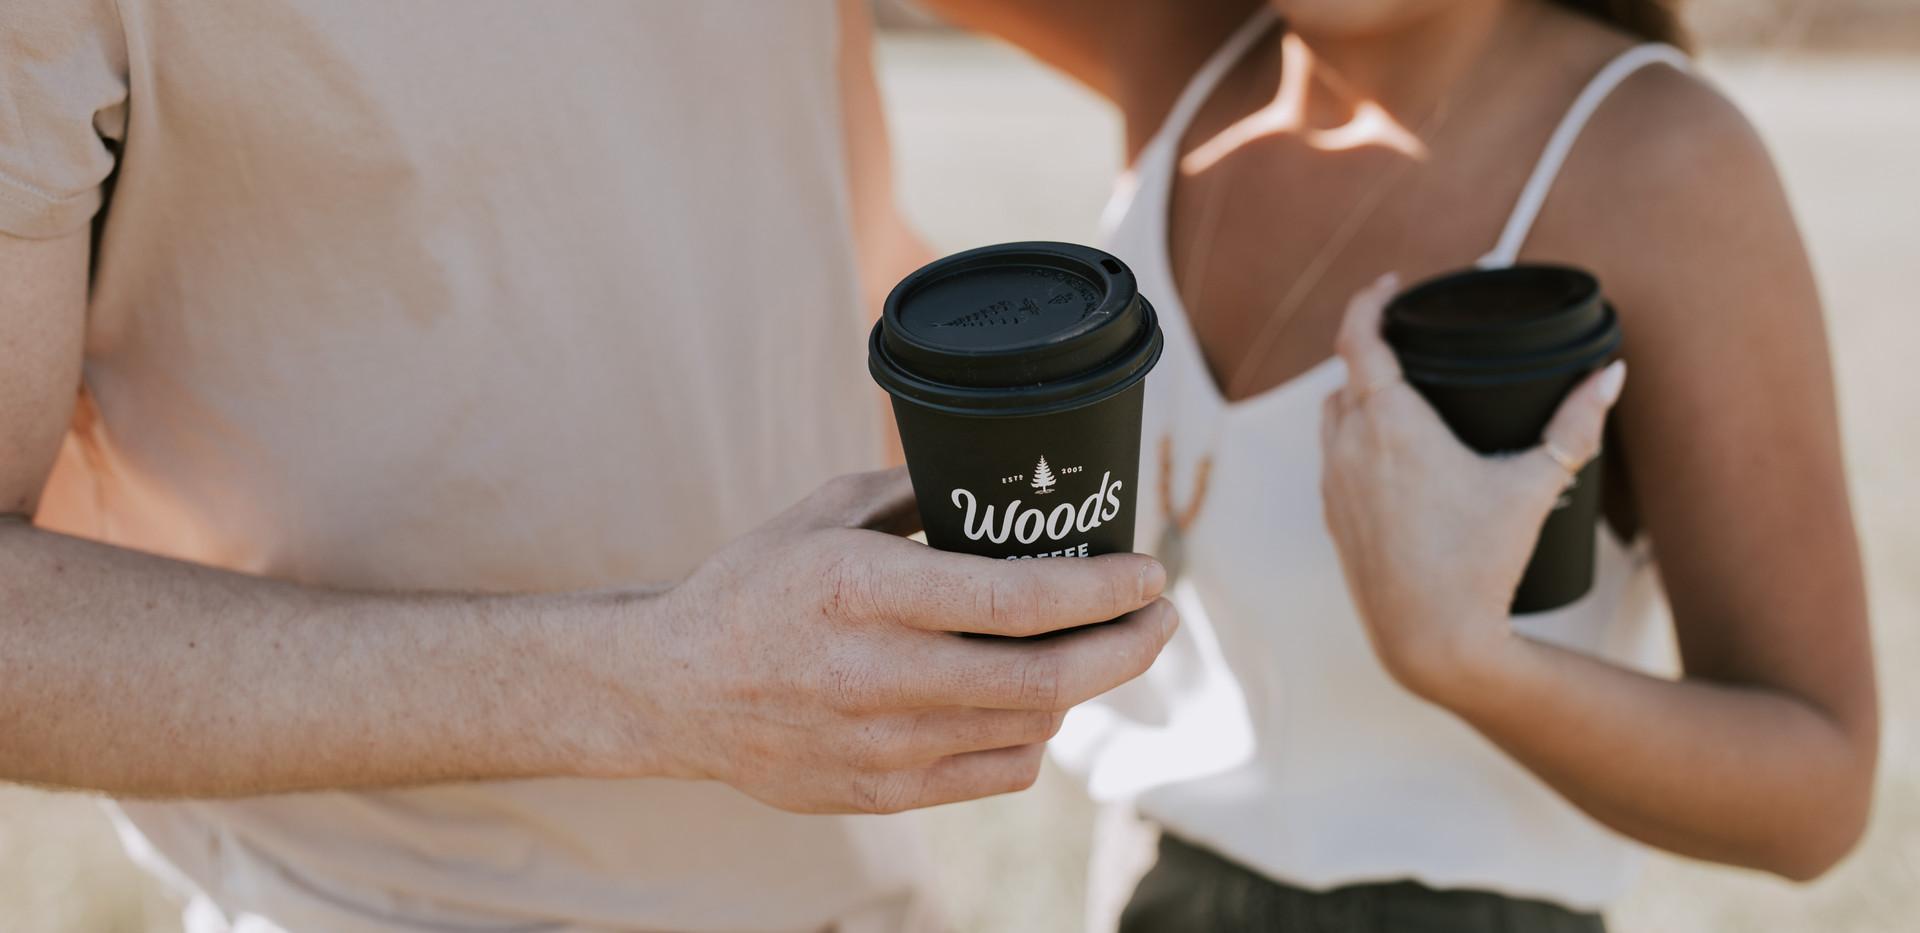 woods-coffee-meraki-photography-nw-belli